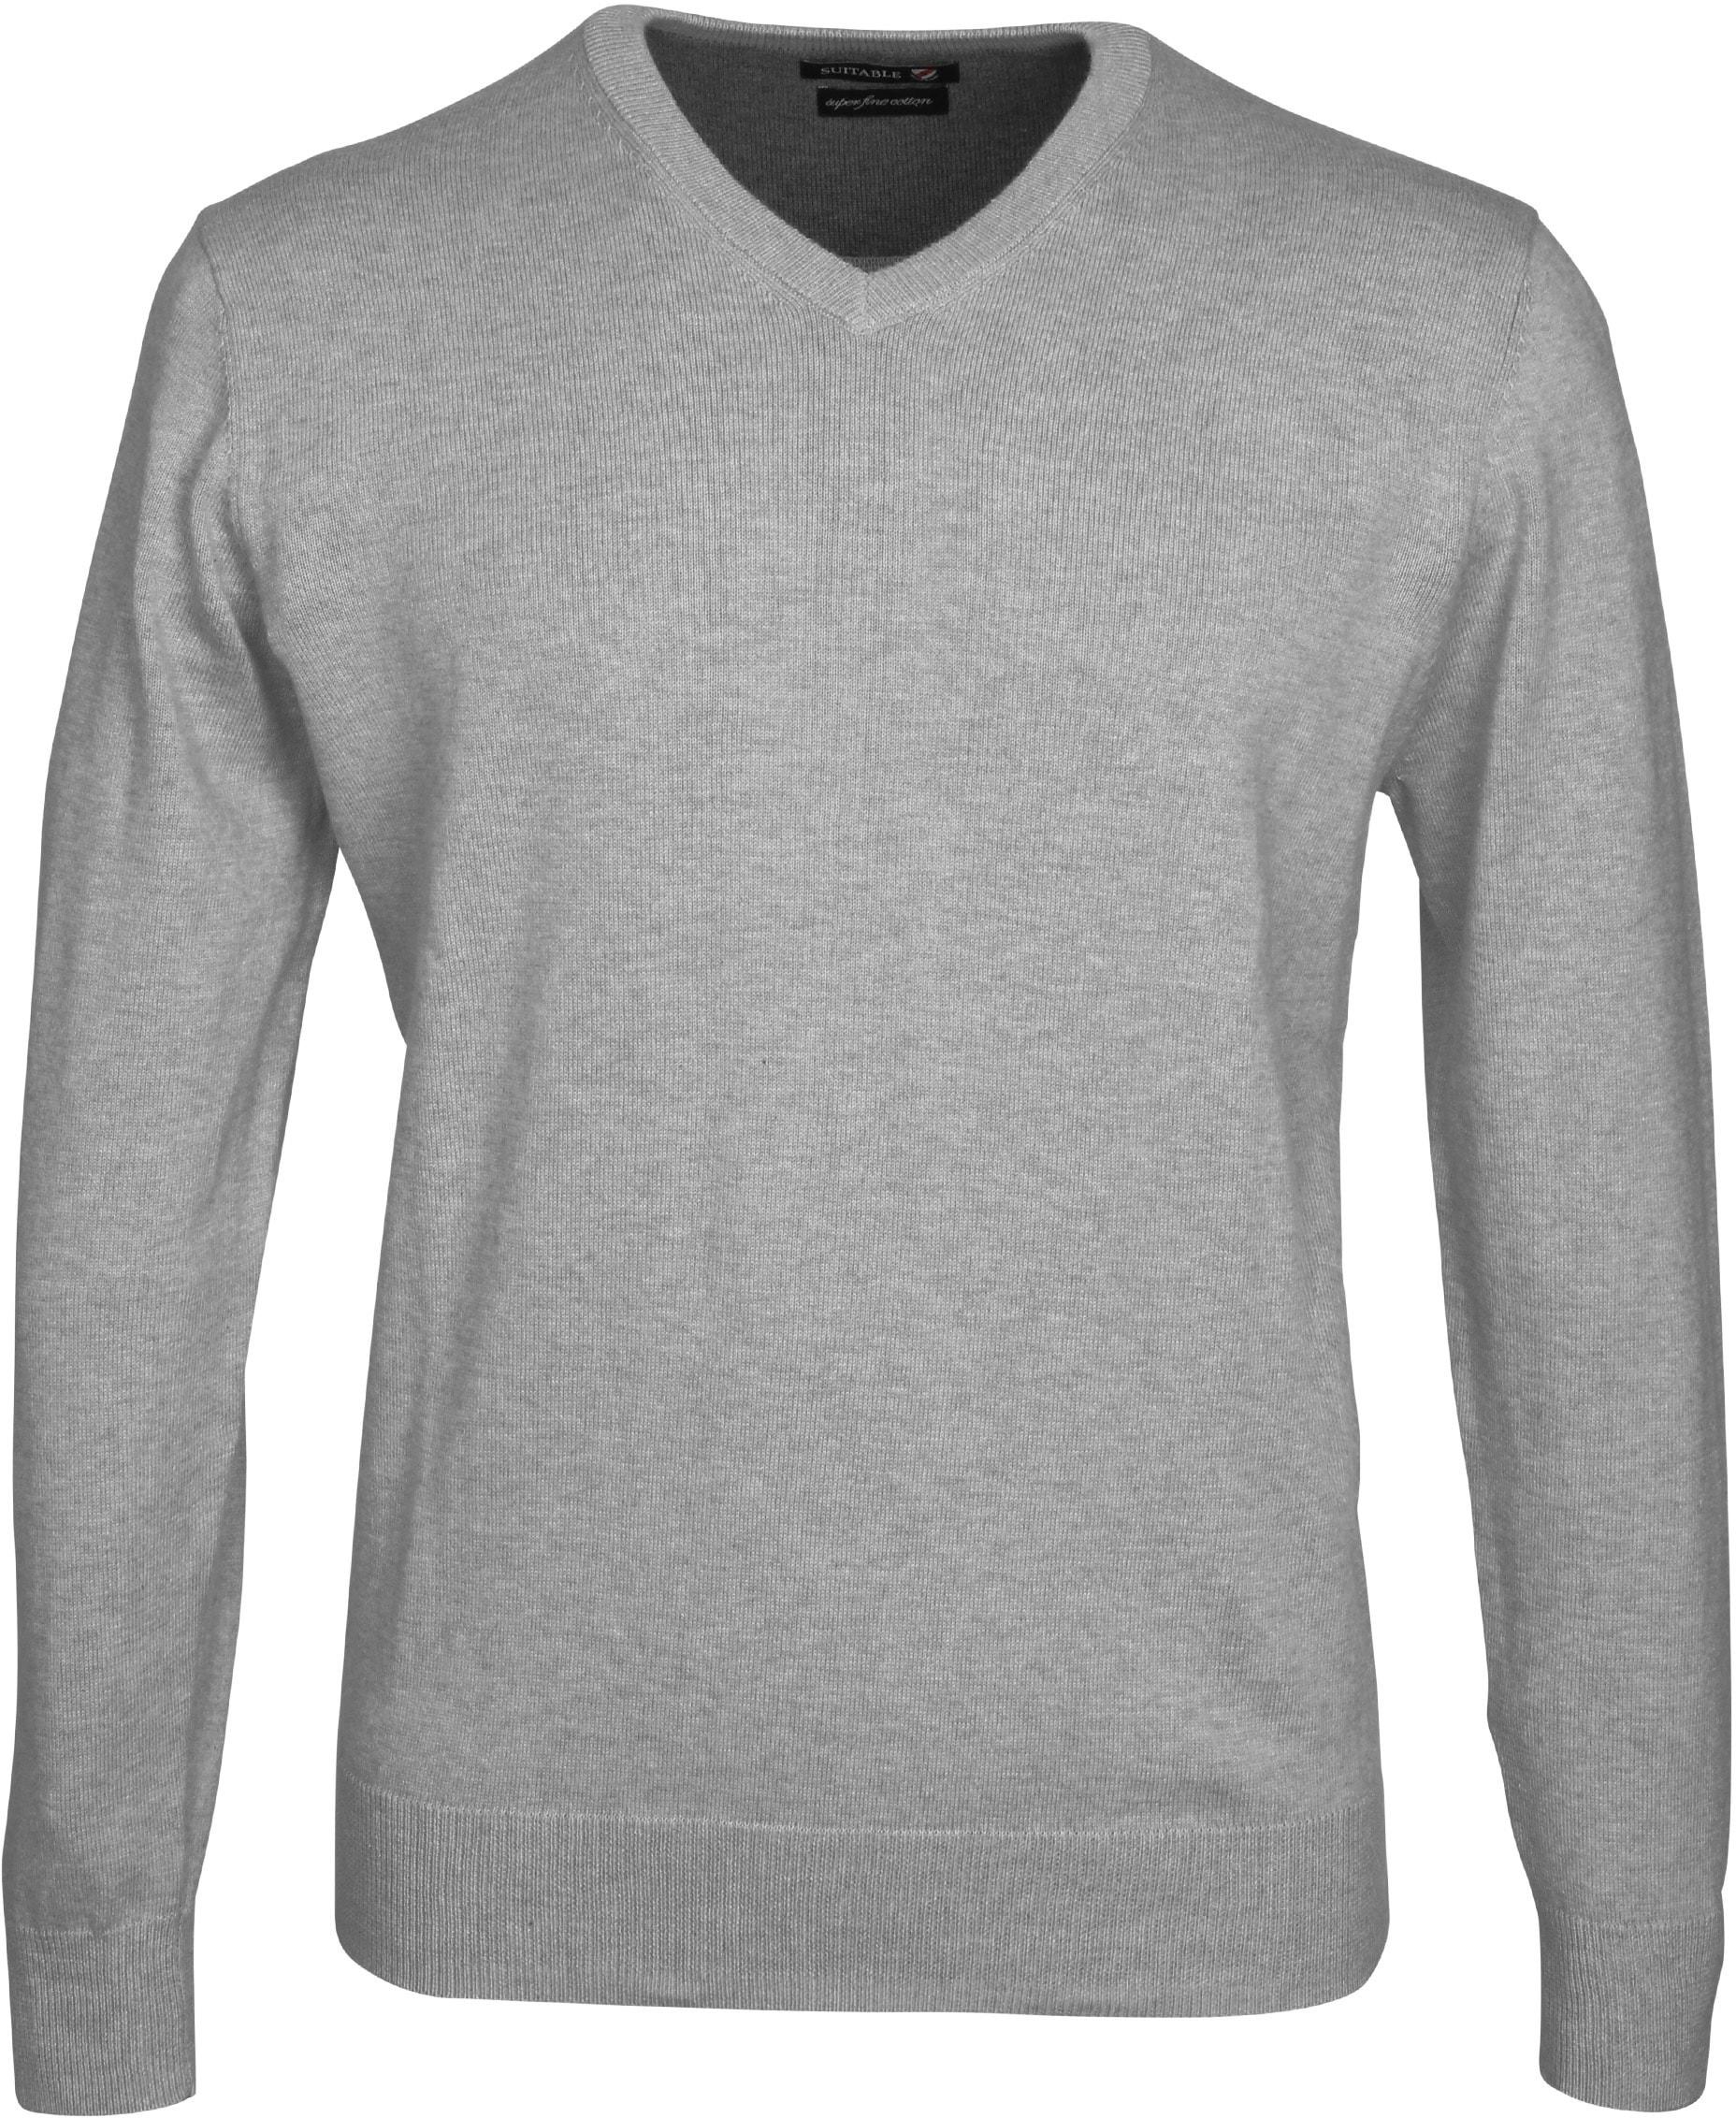 Suitable Pullover Vini Grijs foto 0